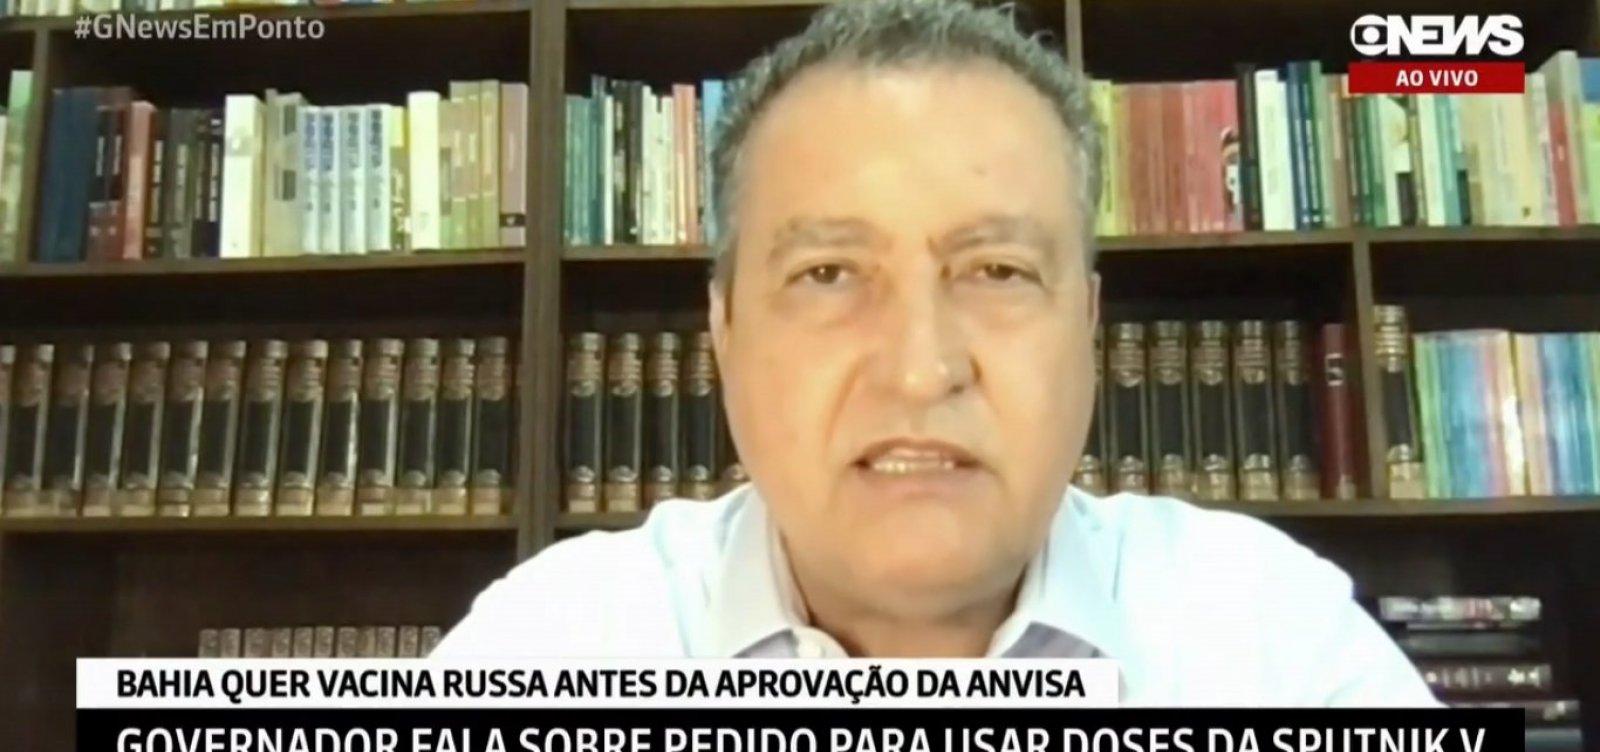 Rui critica 'soberania da Anvisa' e reclama de burocracia para liberar Sputnik V